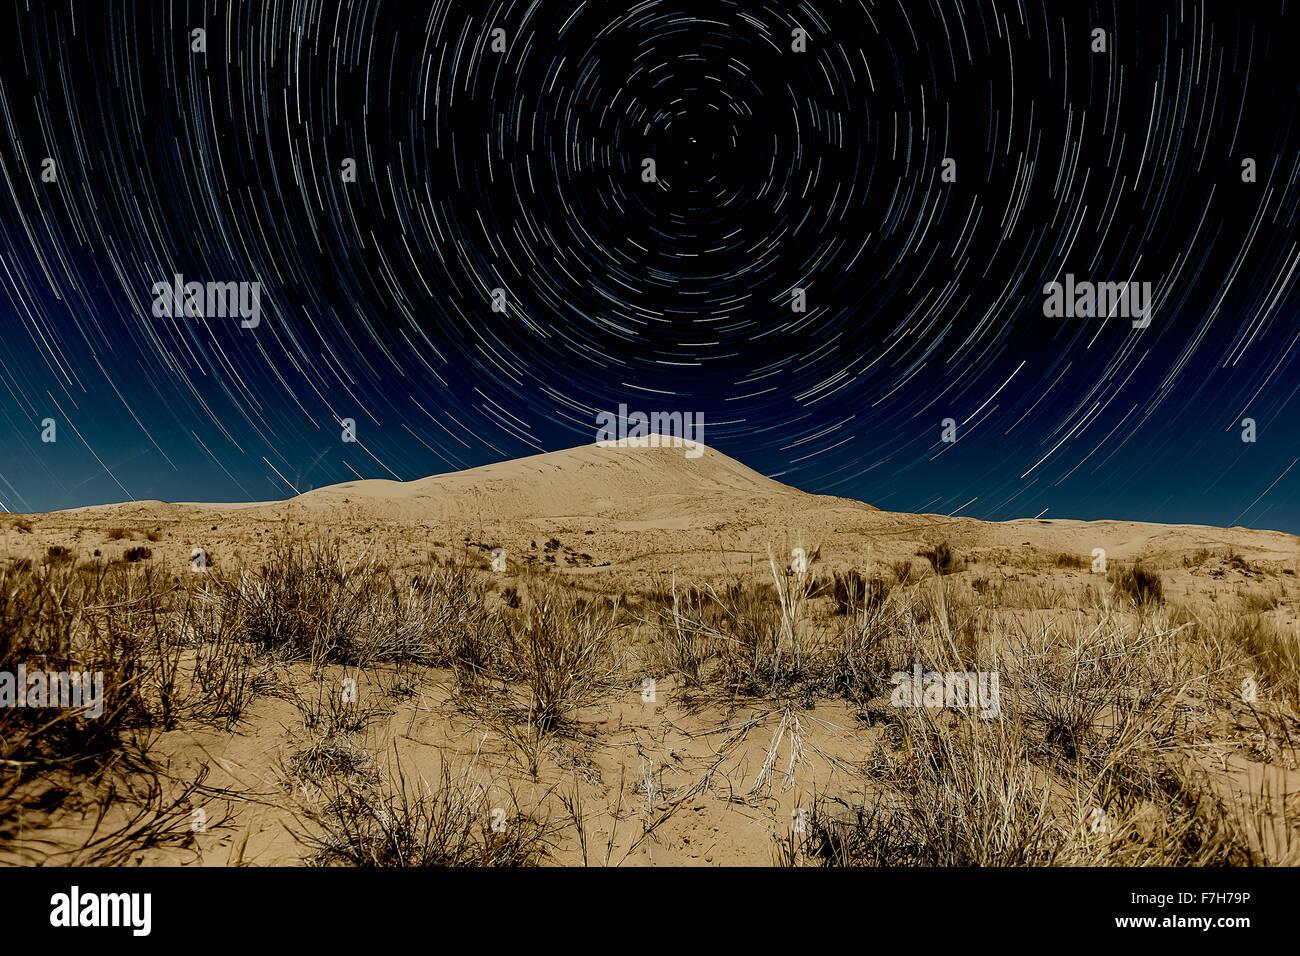 Dunes de Kelso, Mojave National Preserve avec star trails Photo Stock